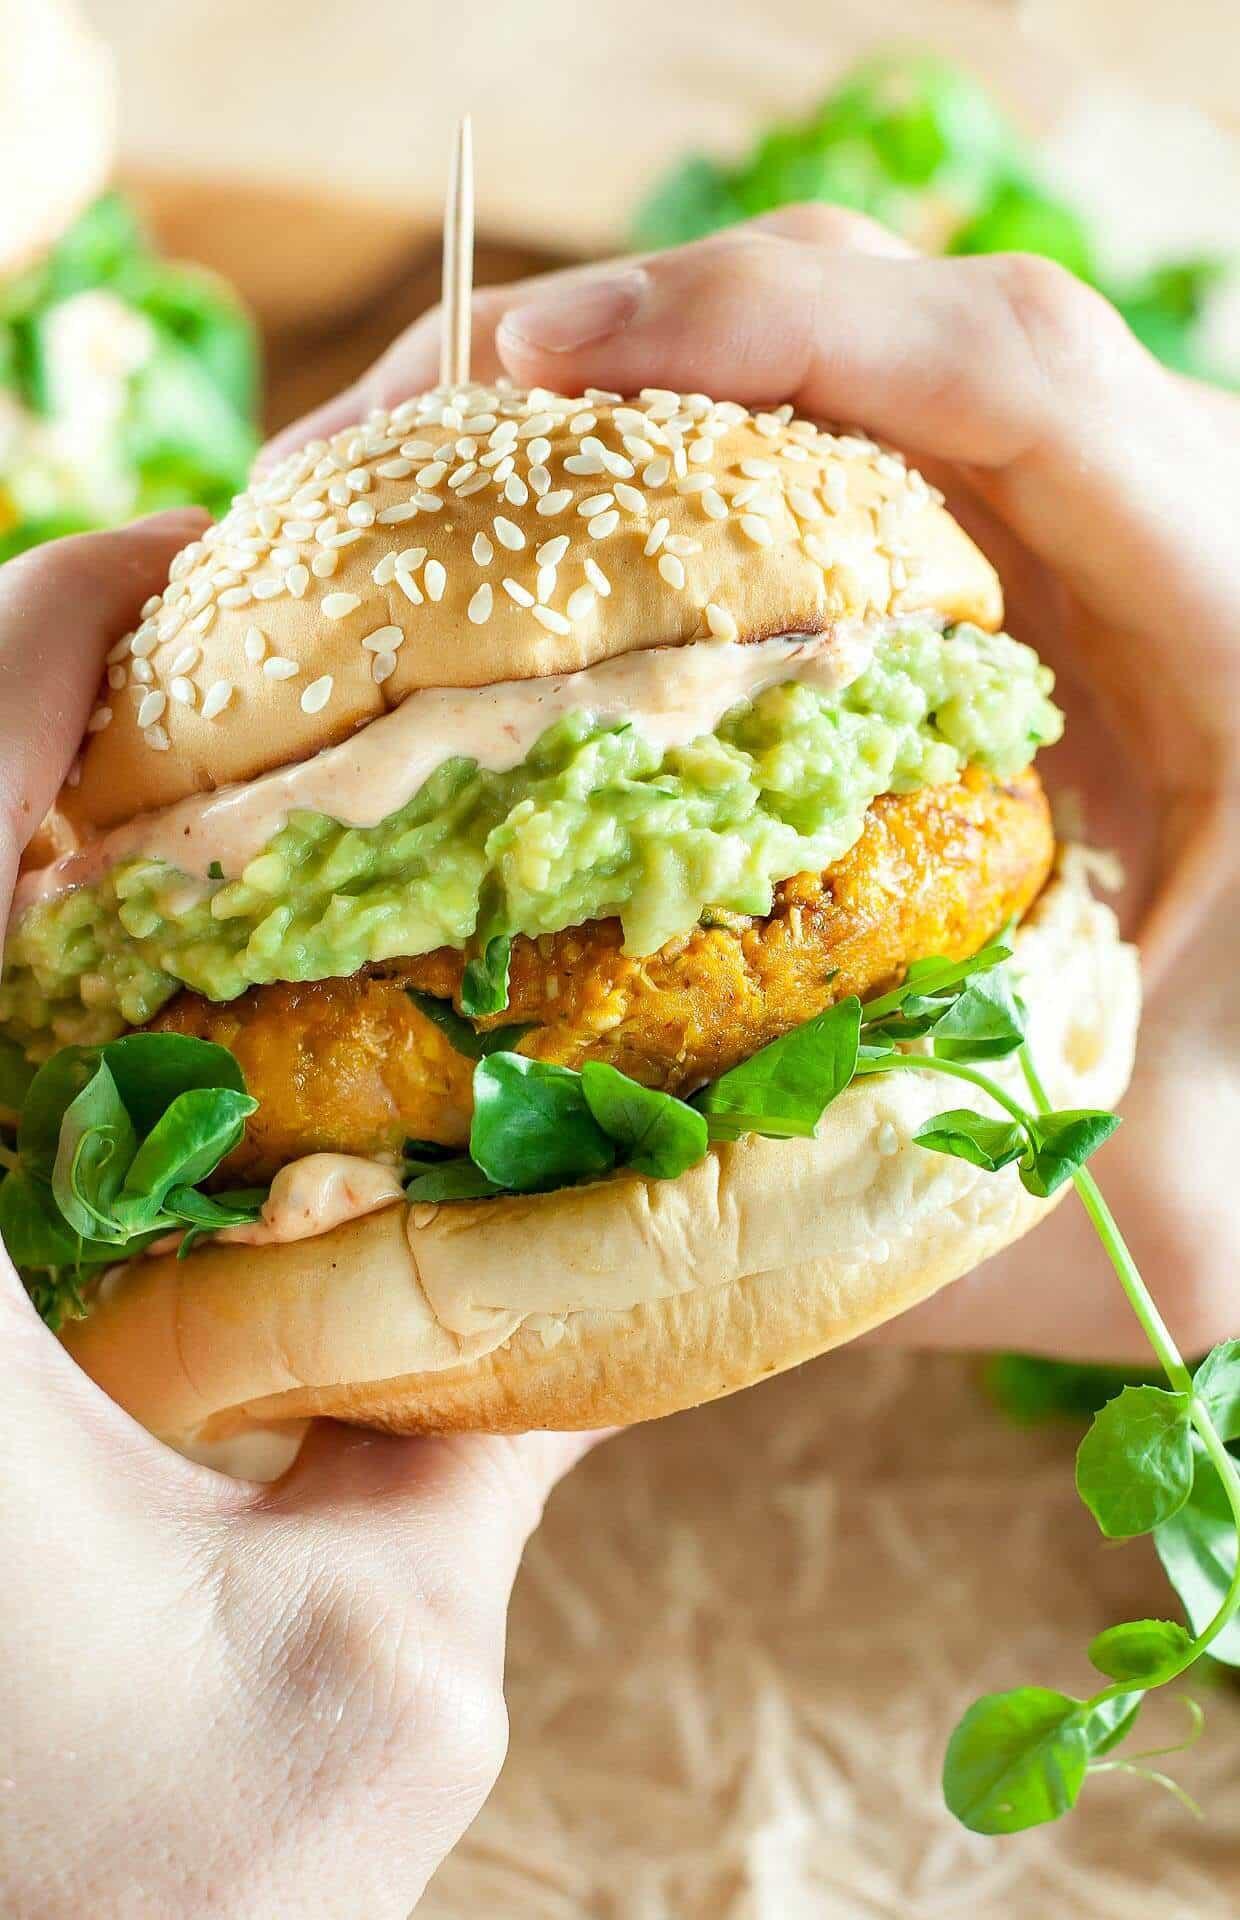 chipotle-pumpkin-veggie-burger-avocado-mash-x-1664-1